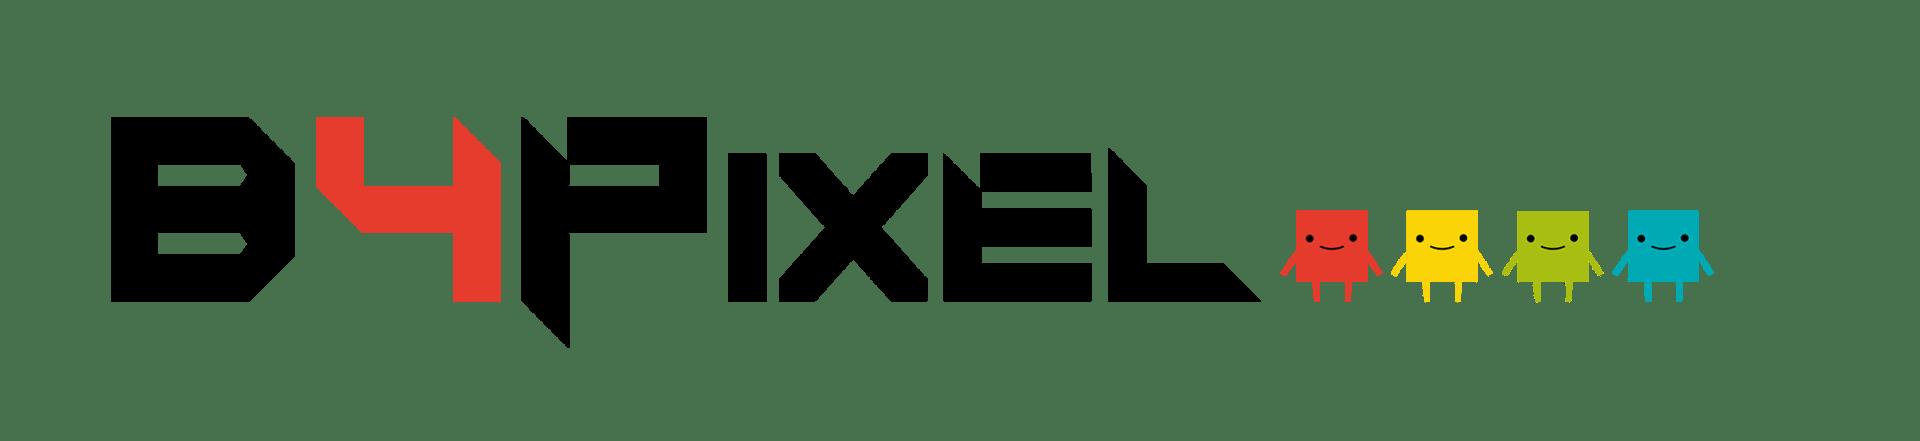 B4Pixel GmbH – Medienproduktion Logo